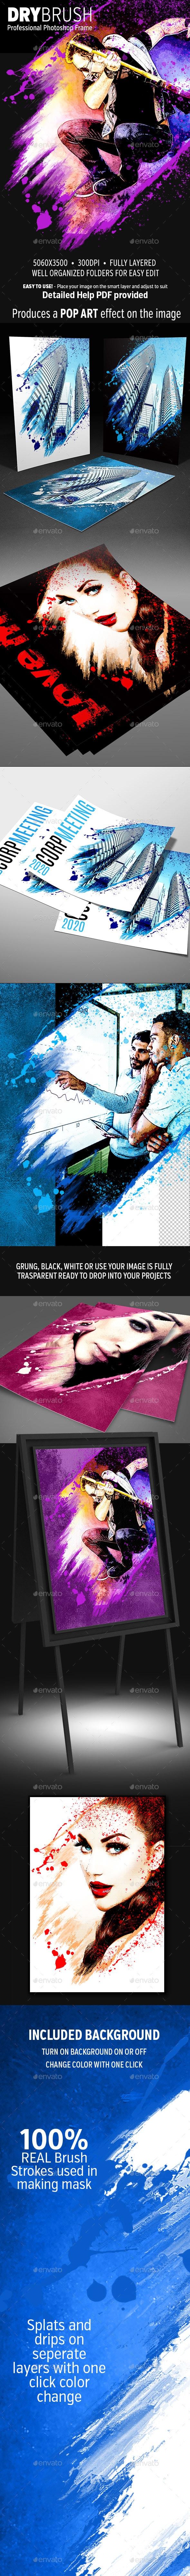 DRYbrush Photo Template - Photo Templates Graphics